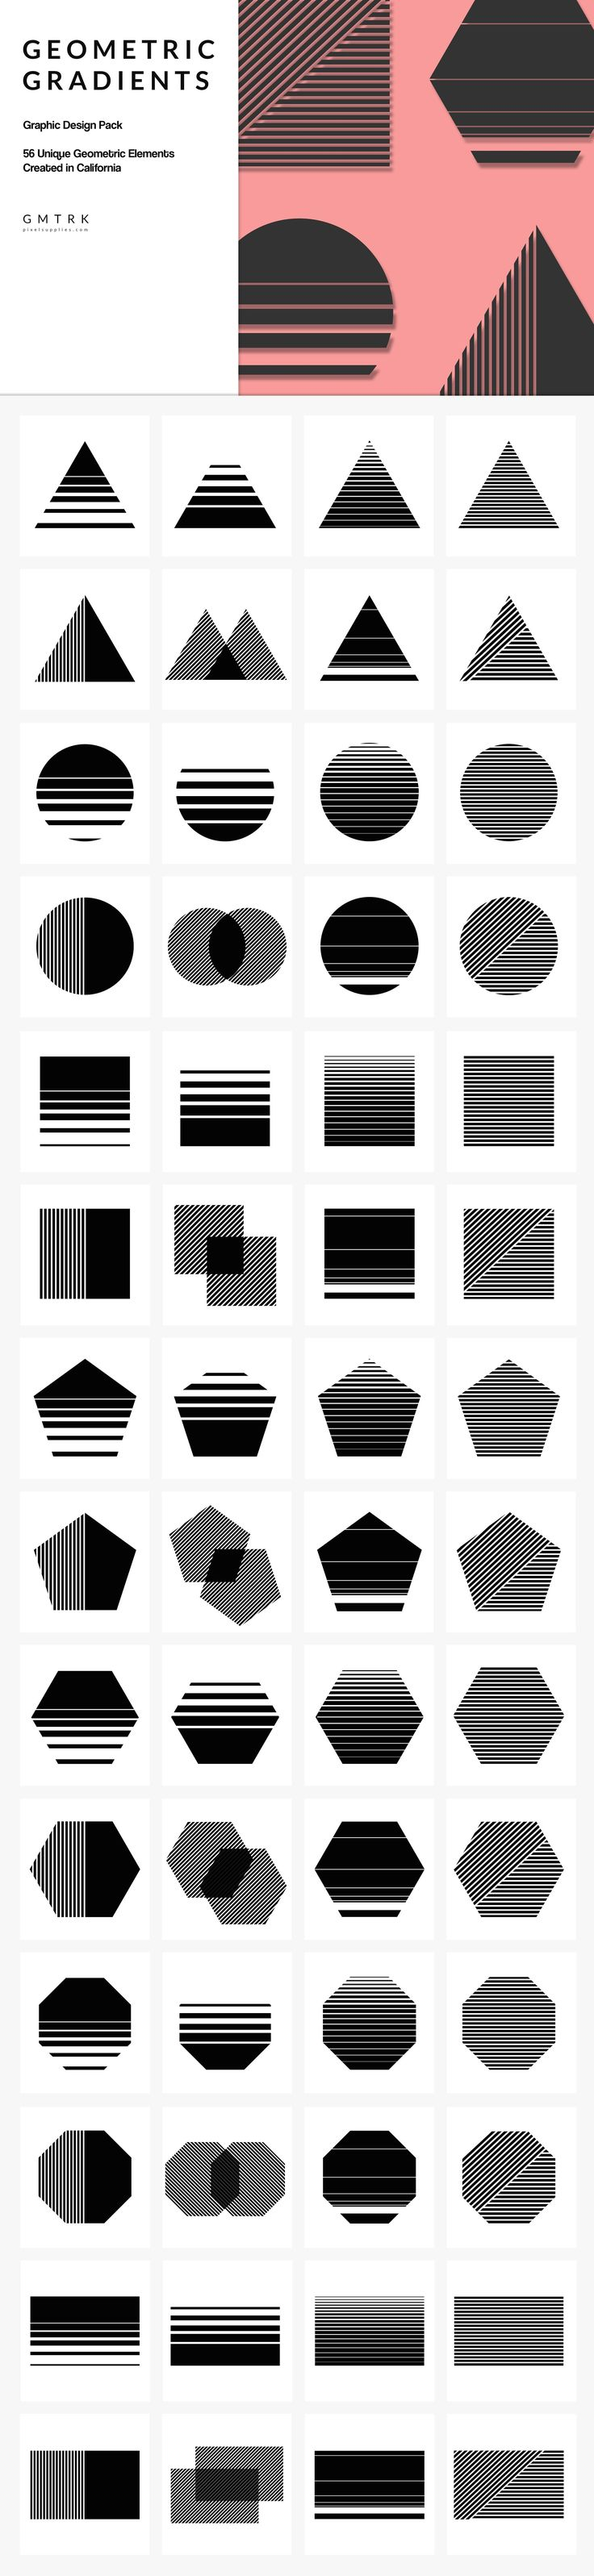 Geometric Gradients - Objects - 1